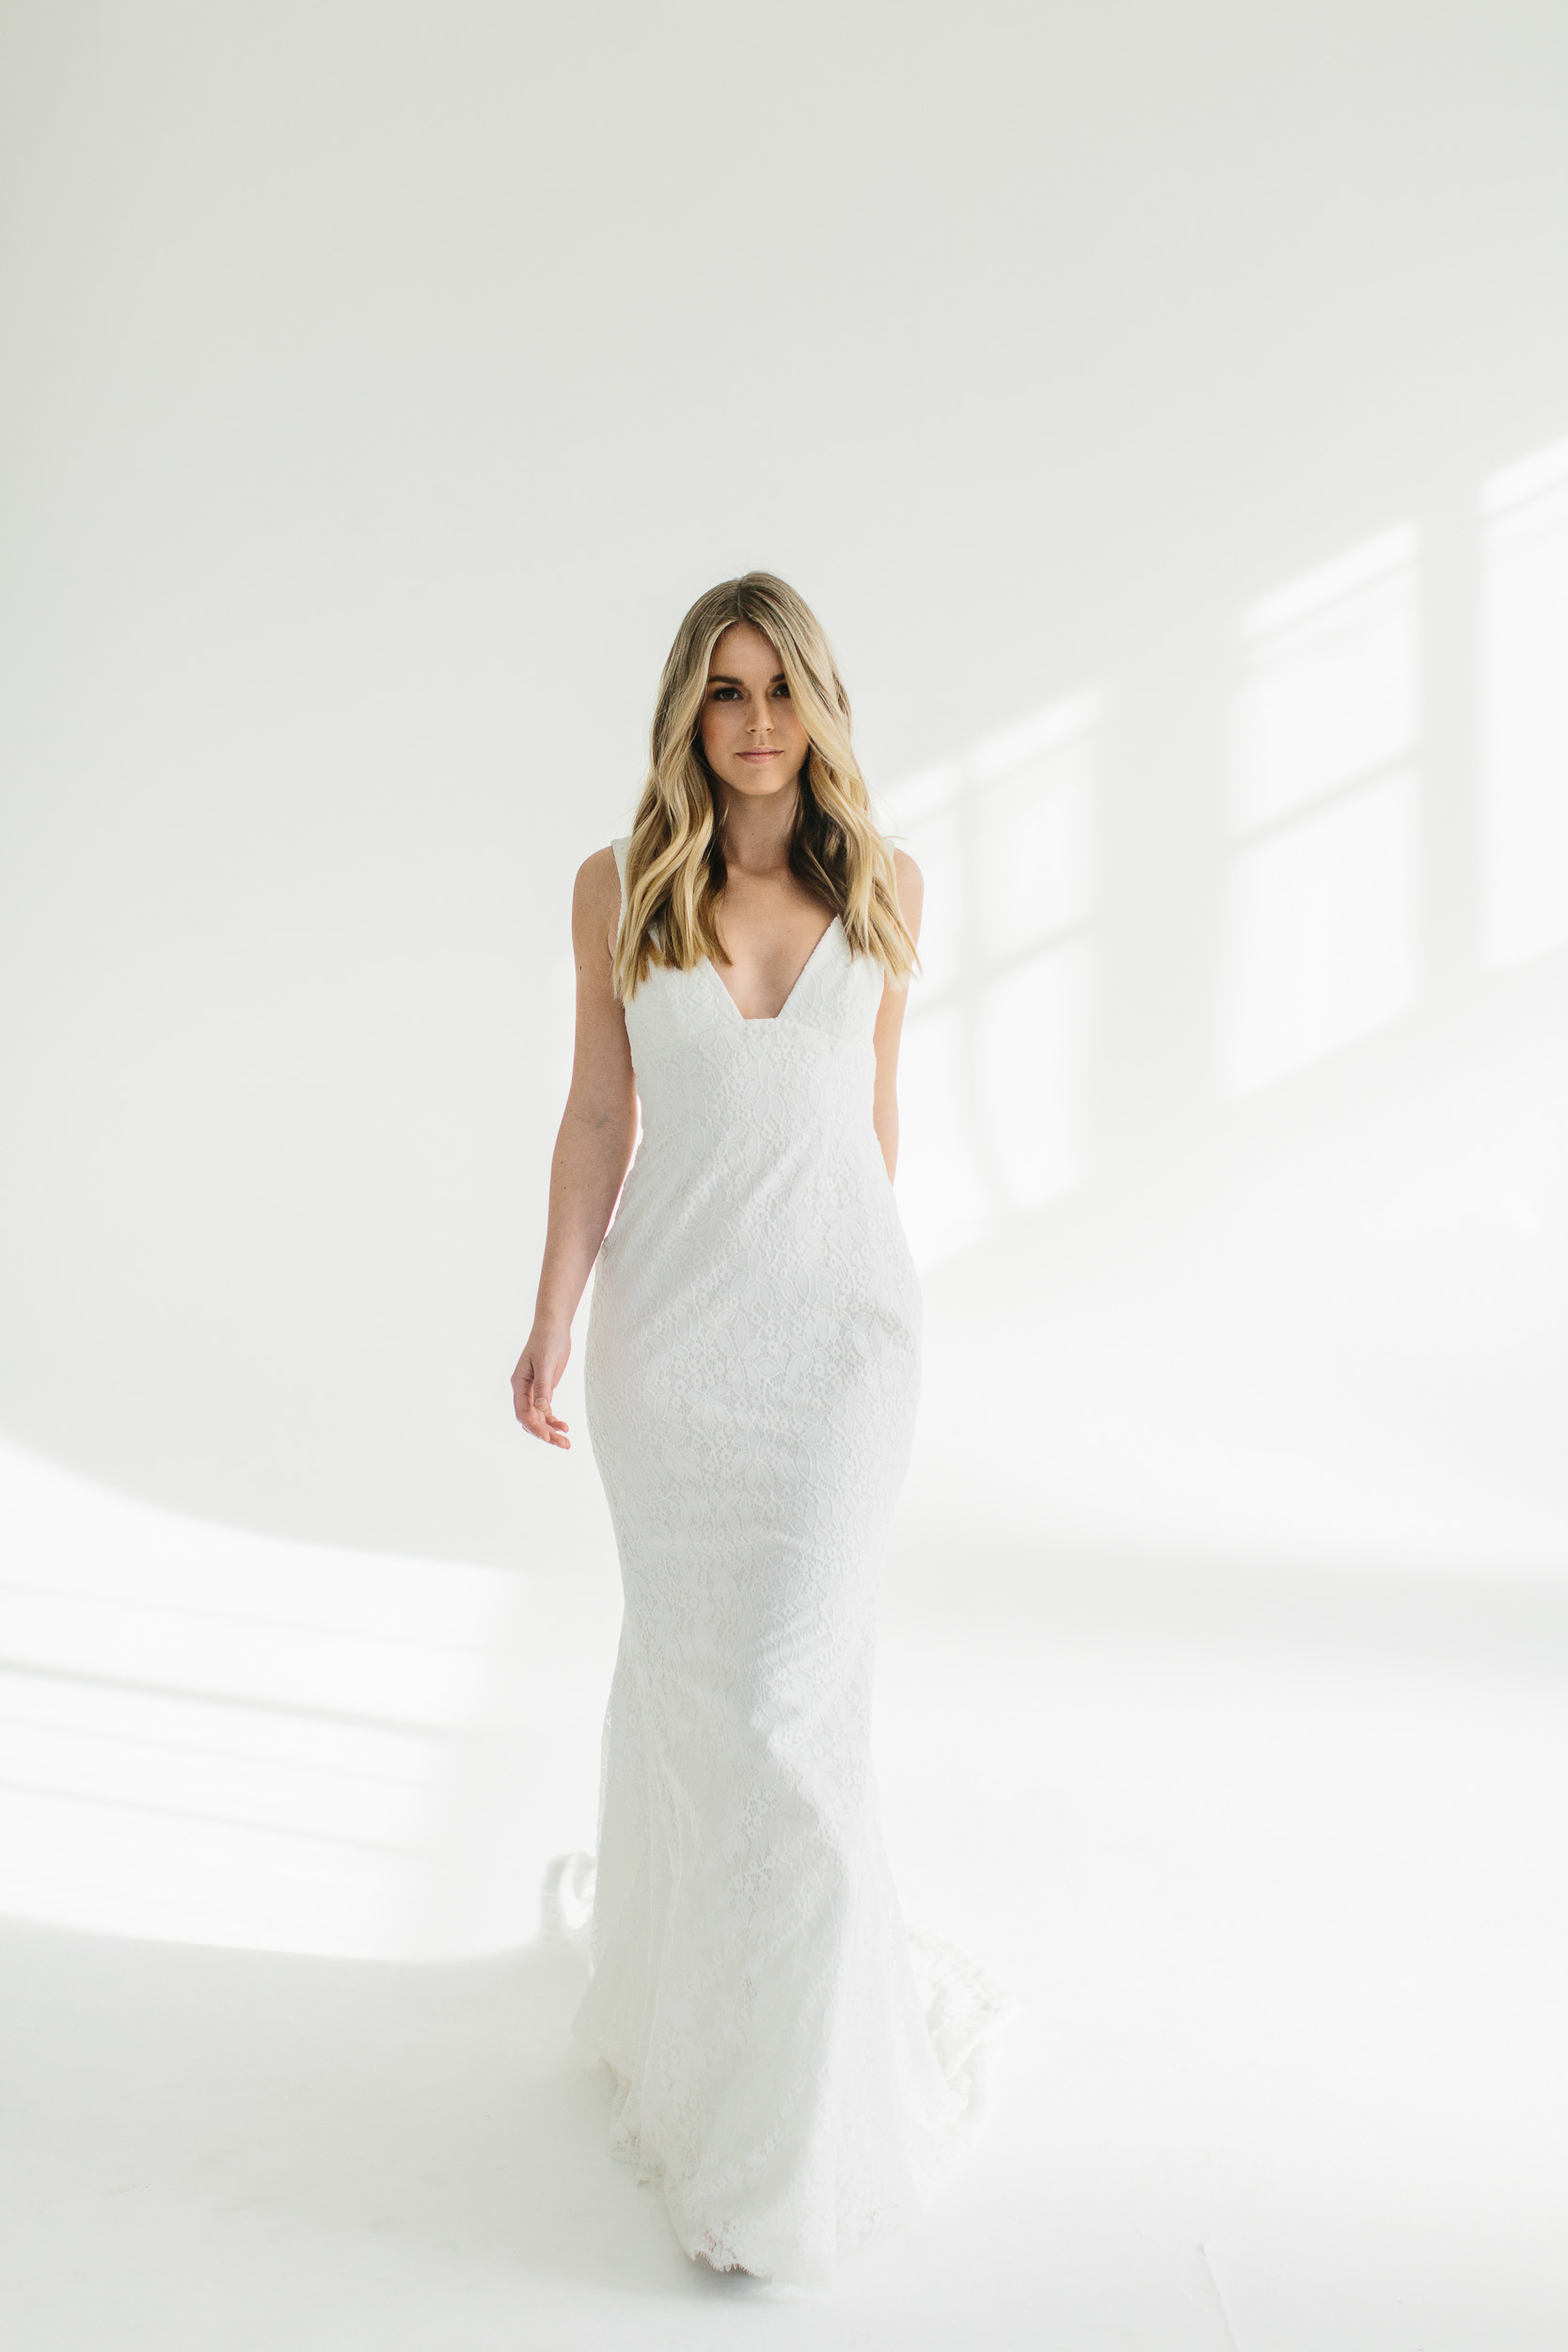 Kas-Richards-Karen-Willis_Holmes-Bridal-Wild-Hearts-Collection-148.jpg